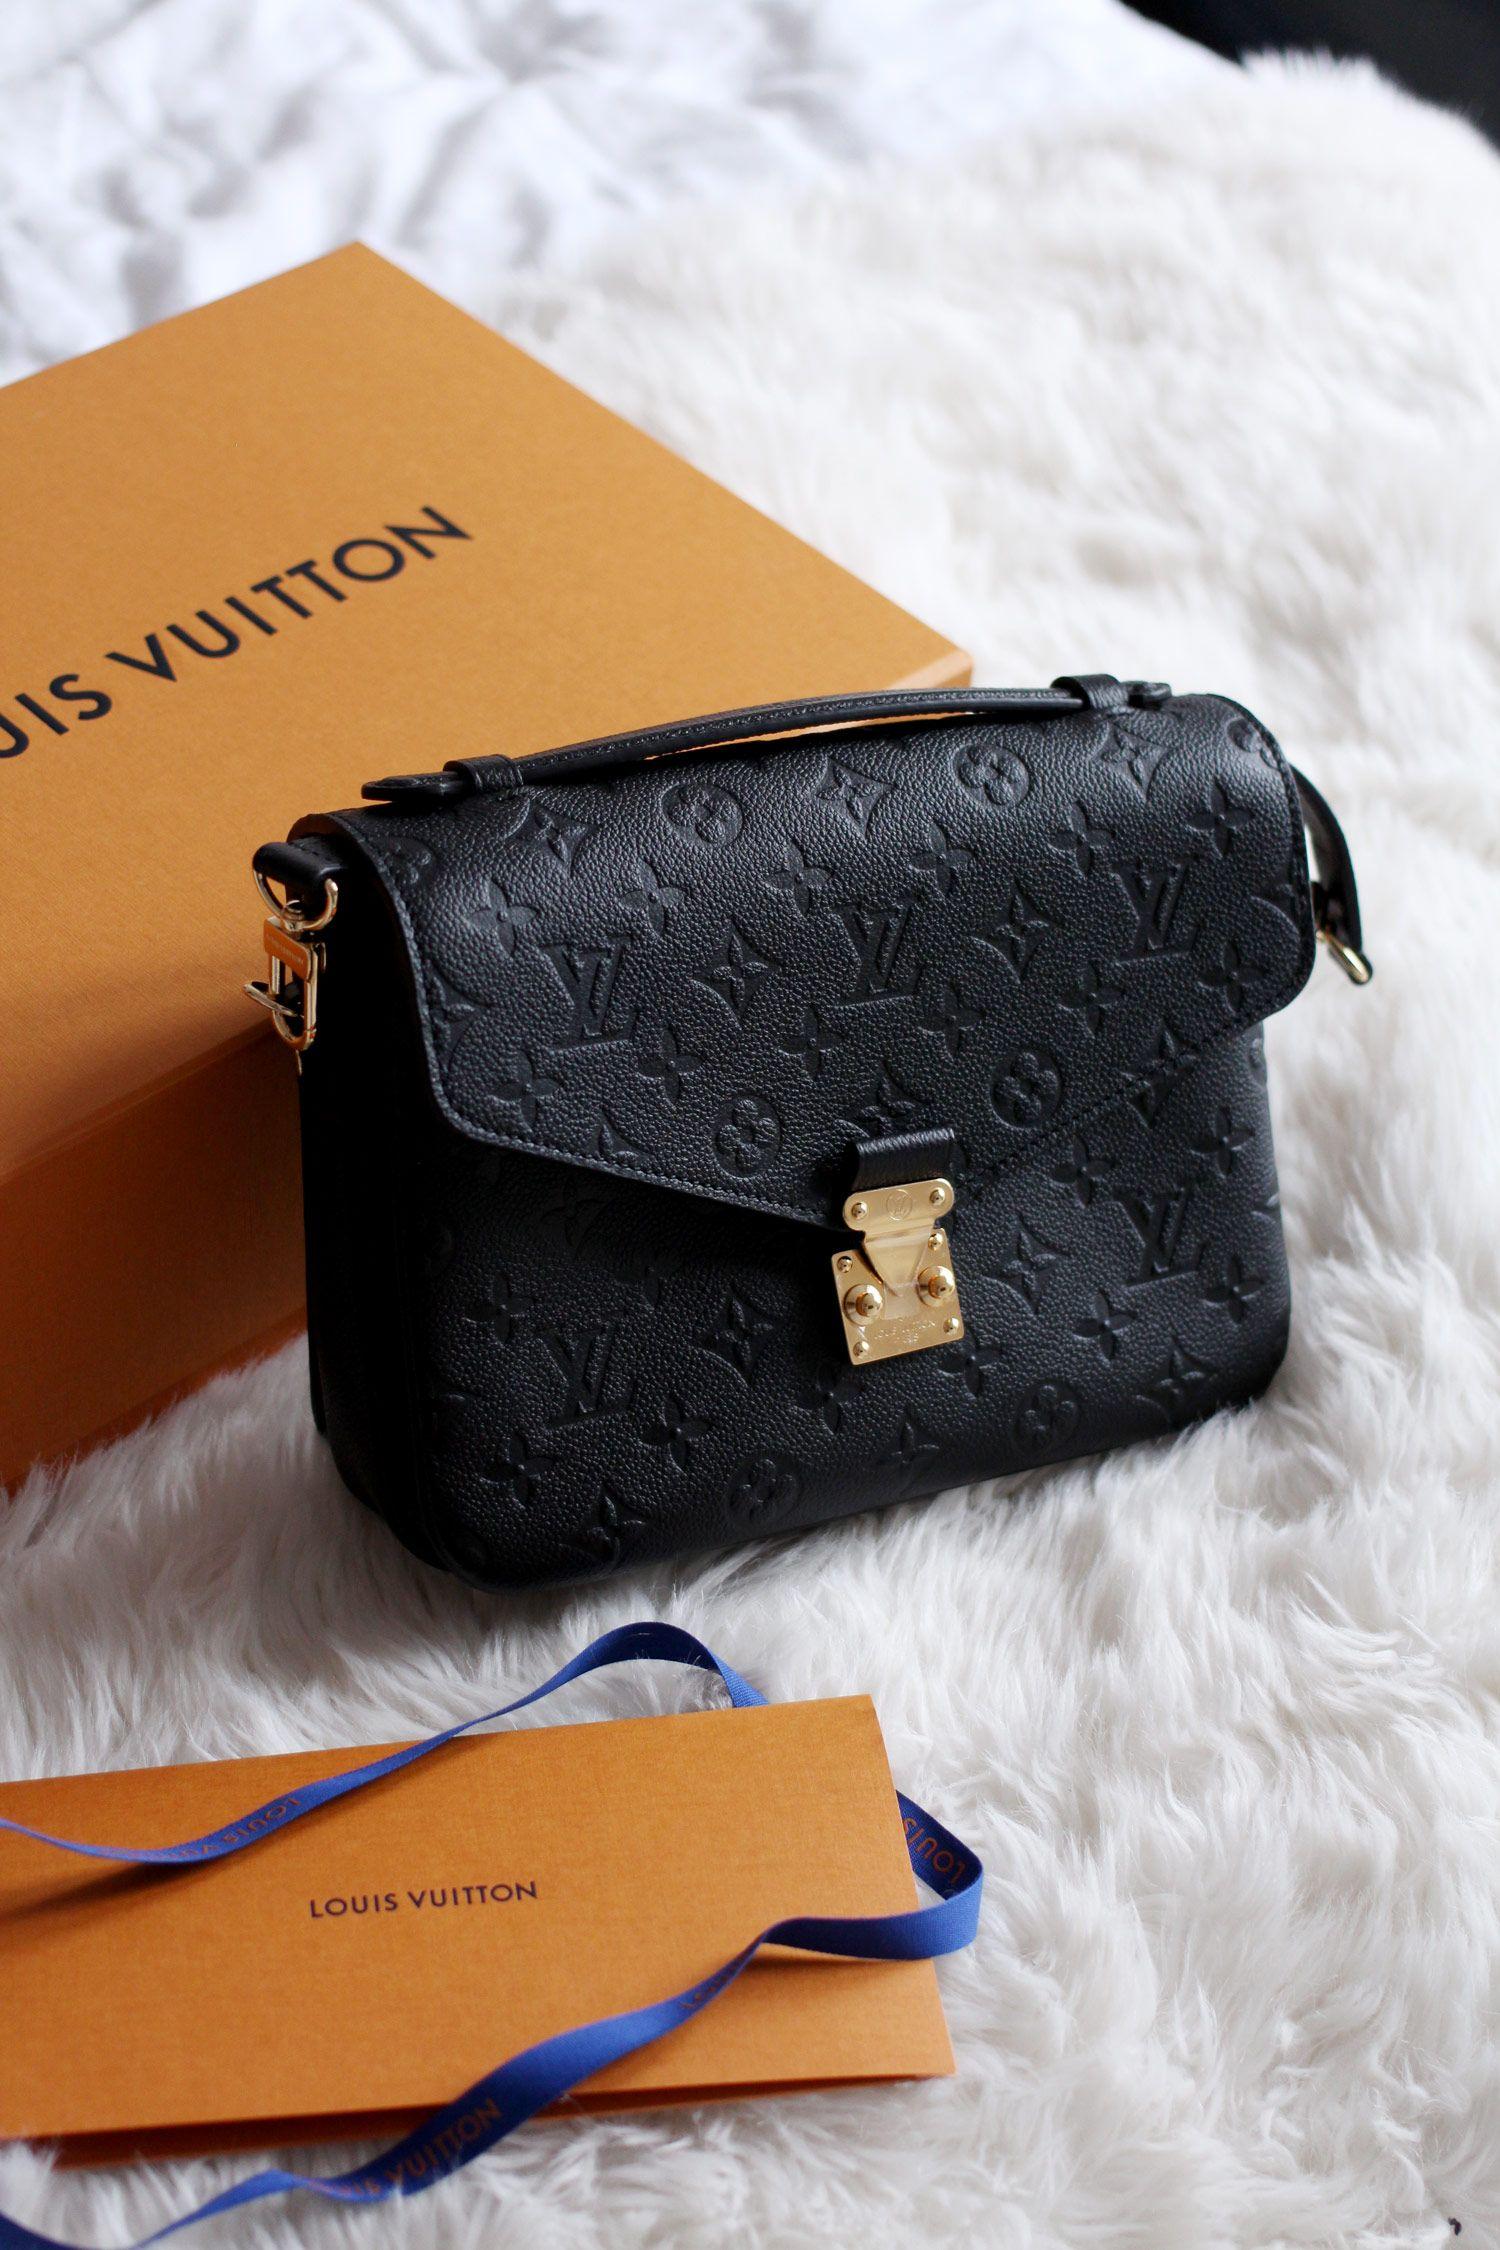 c25941c19f94 Louis Vuitton Pochette Metis in black monogram empreinte leather with gold  hardware